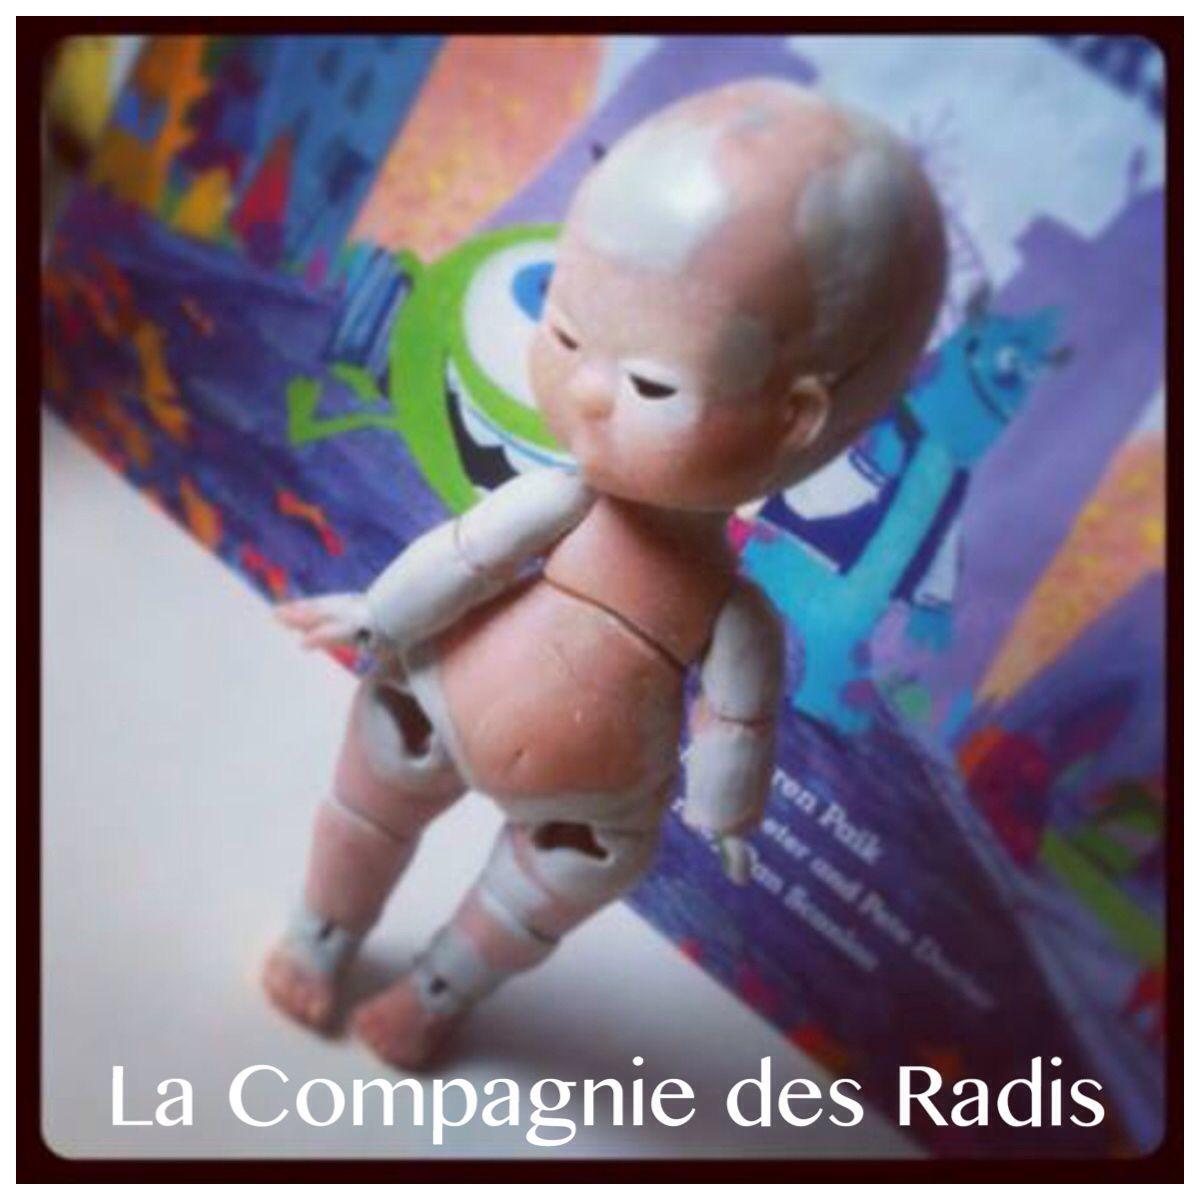 La Compagnie des Radis BJD